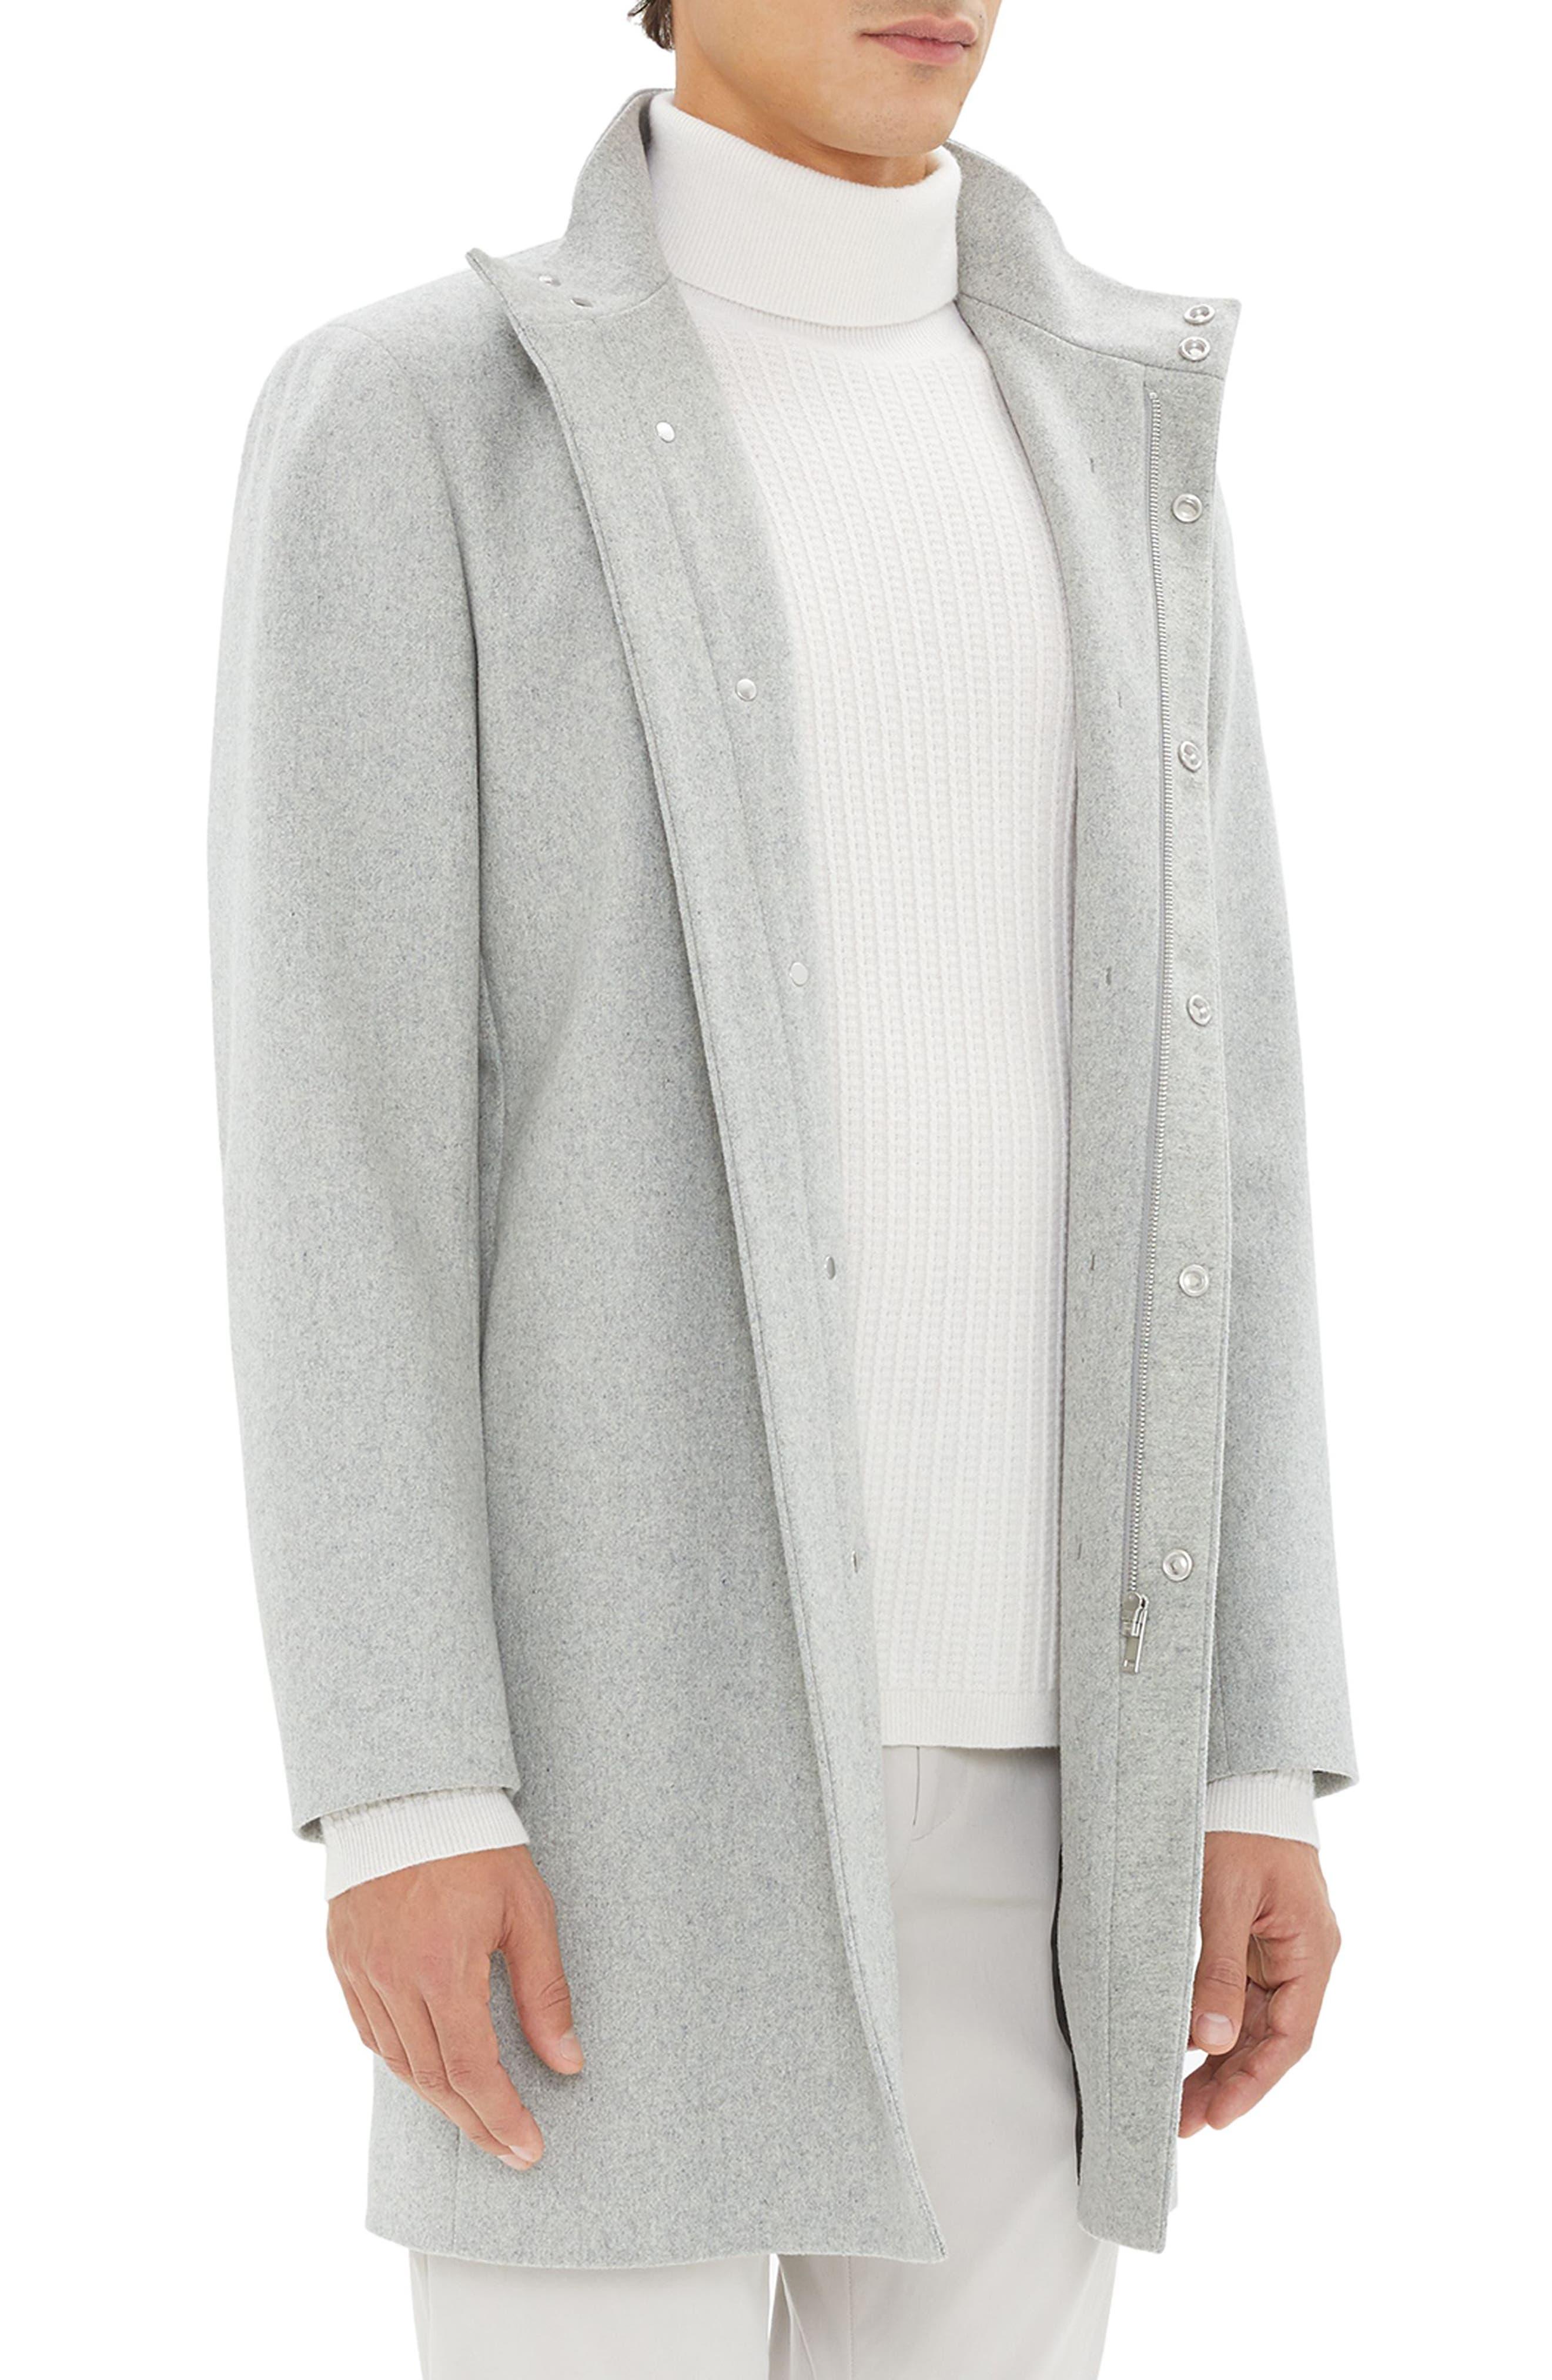 Belvin Modus Melton Wool Blend Coat,                             Alternate thumbnail 3, color,                             GREY MELANGE